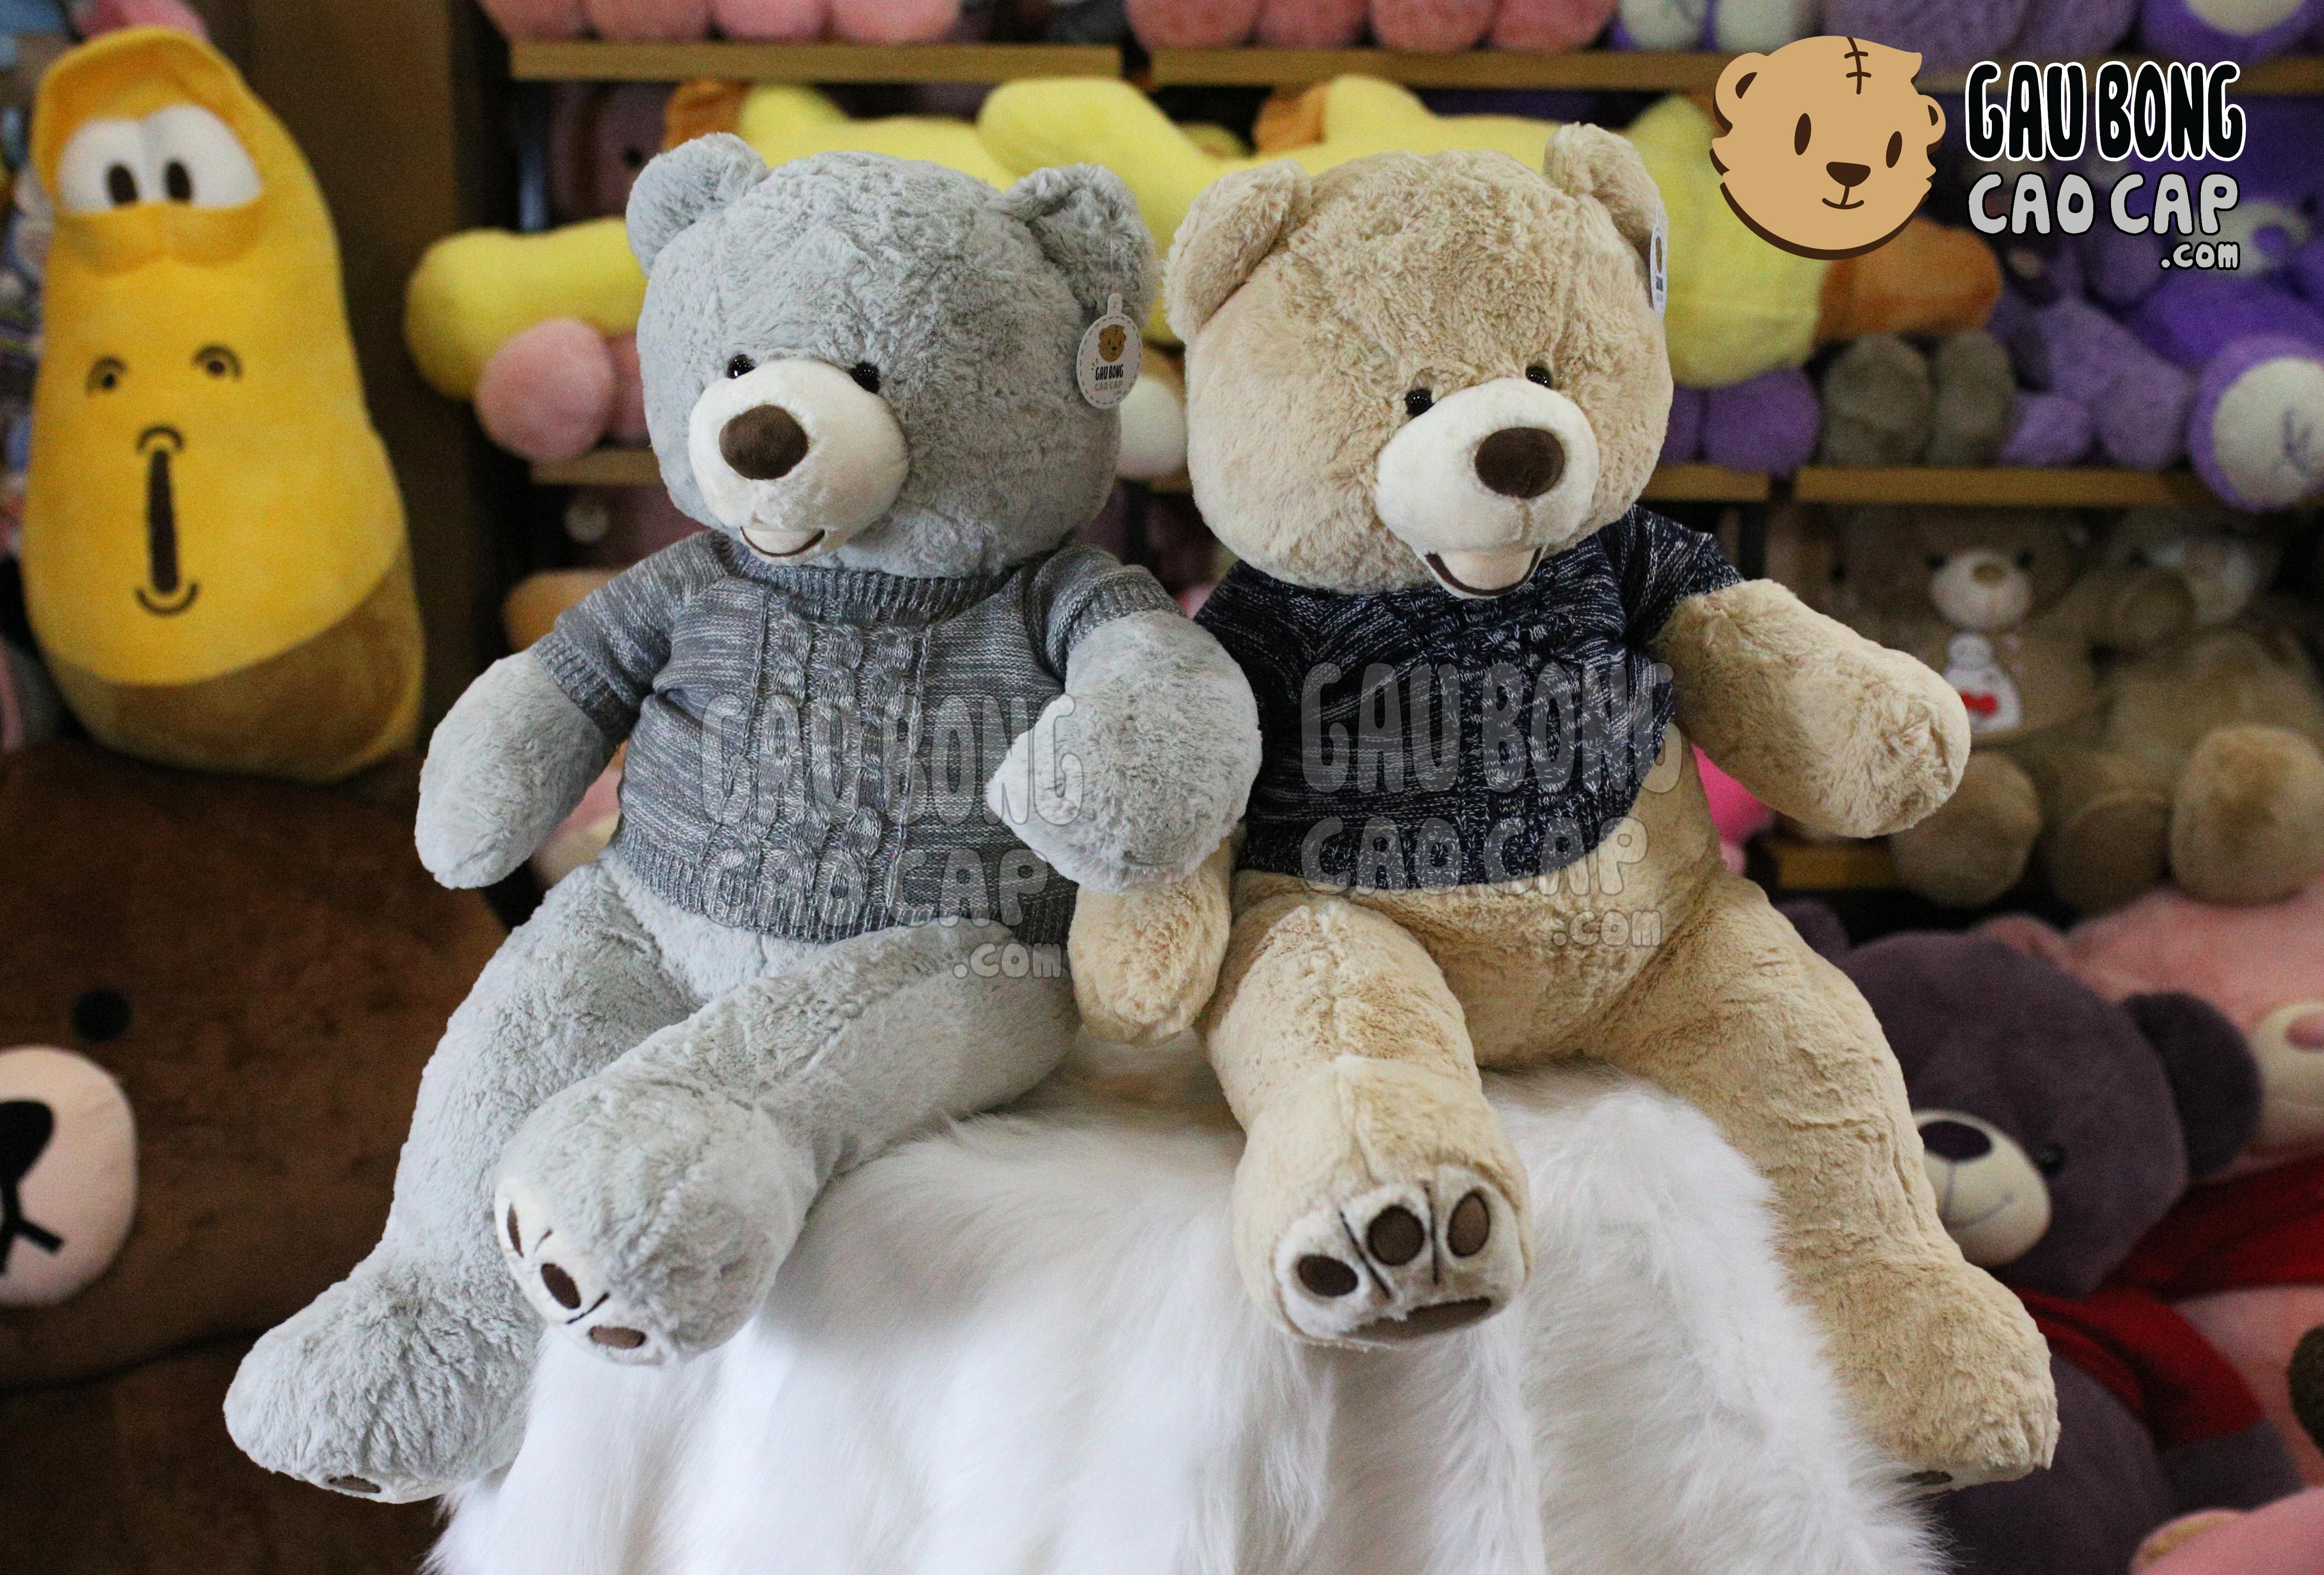 Gấu Teddy costco áo len